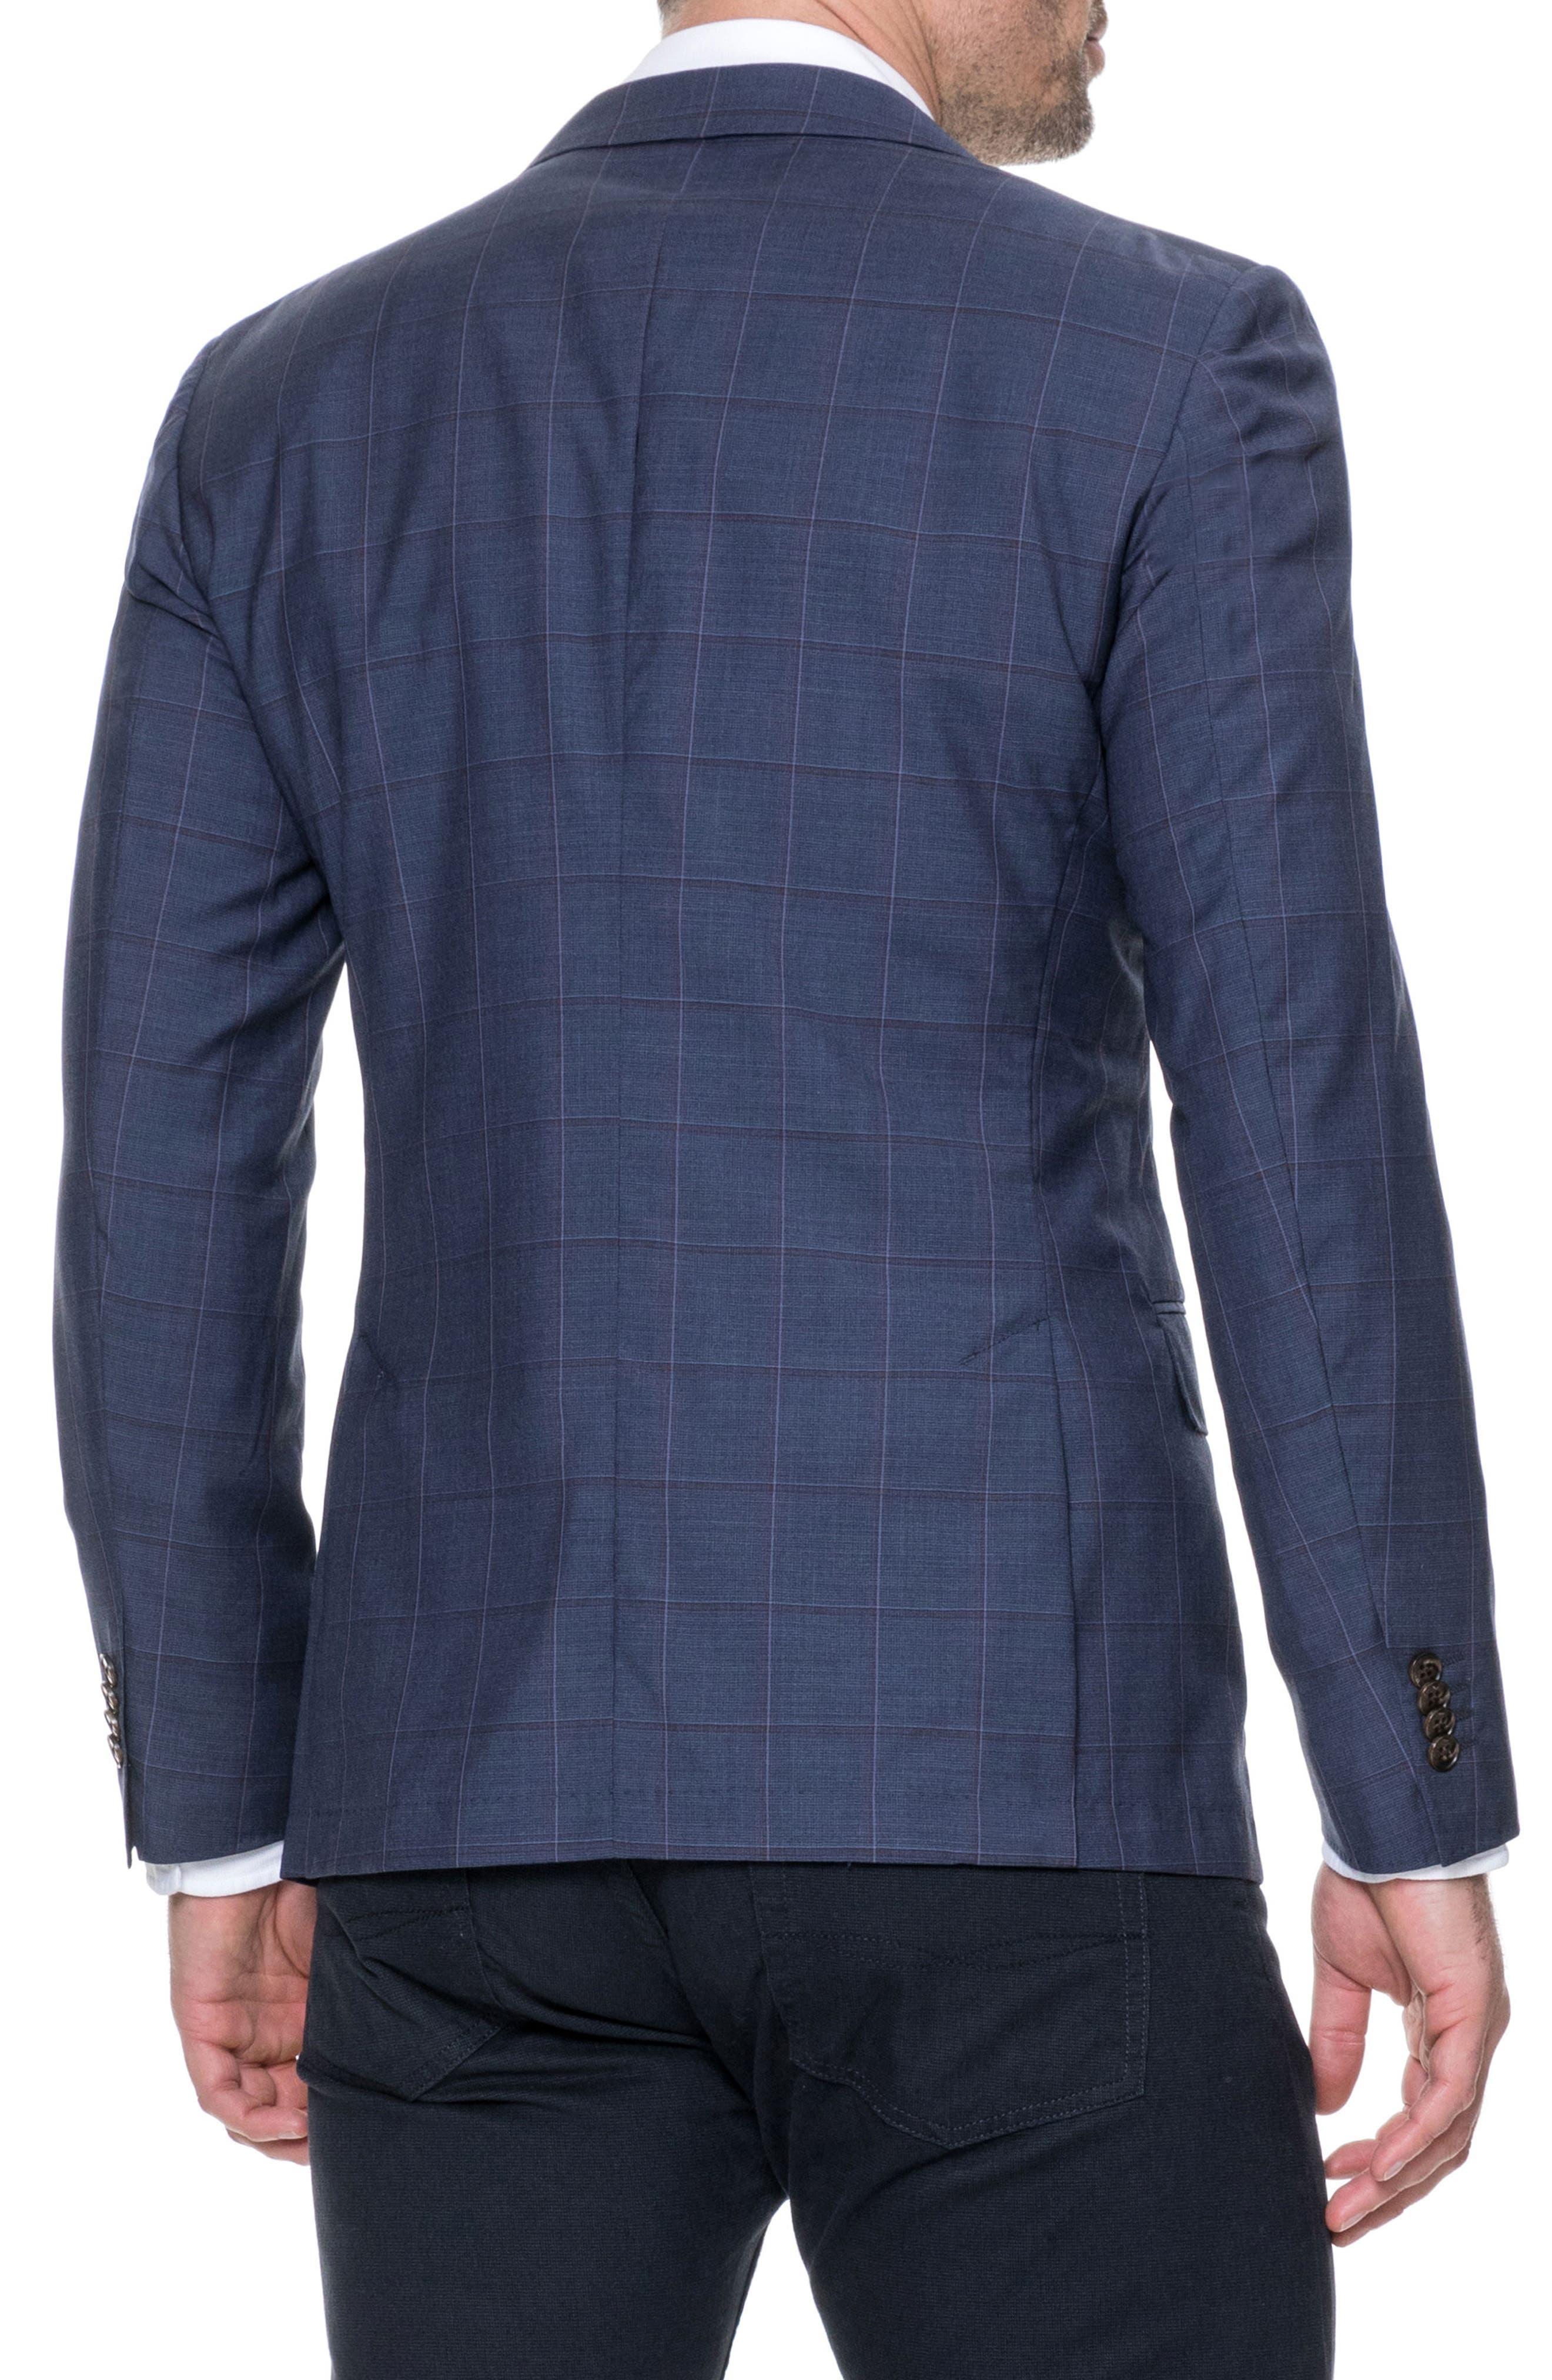 Luxbridge Regular Fit Wool Sport Coat,                             Alternate thumbnail 2, color,                             412